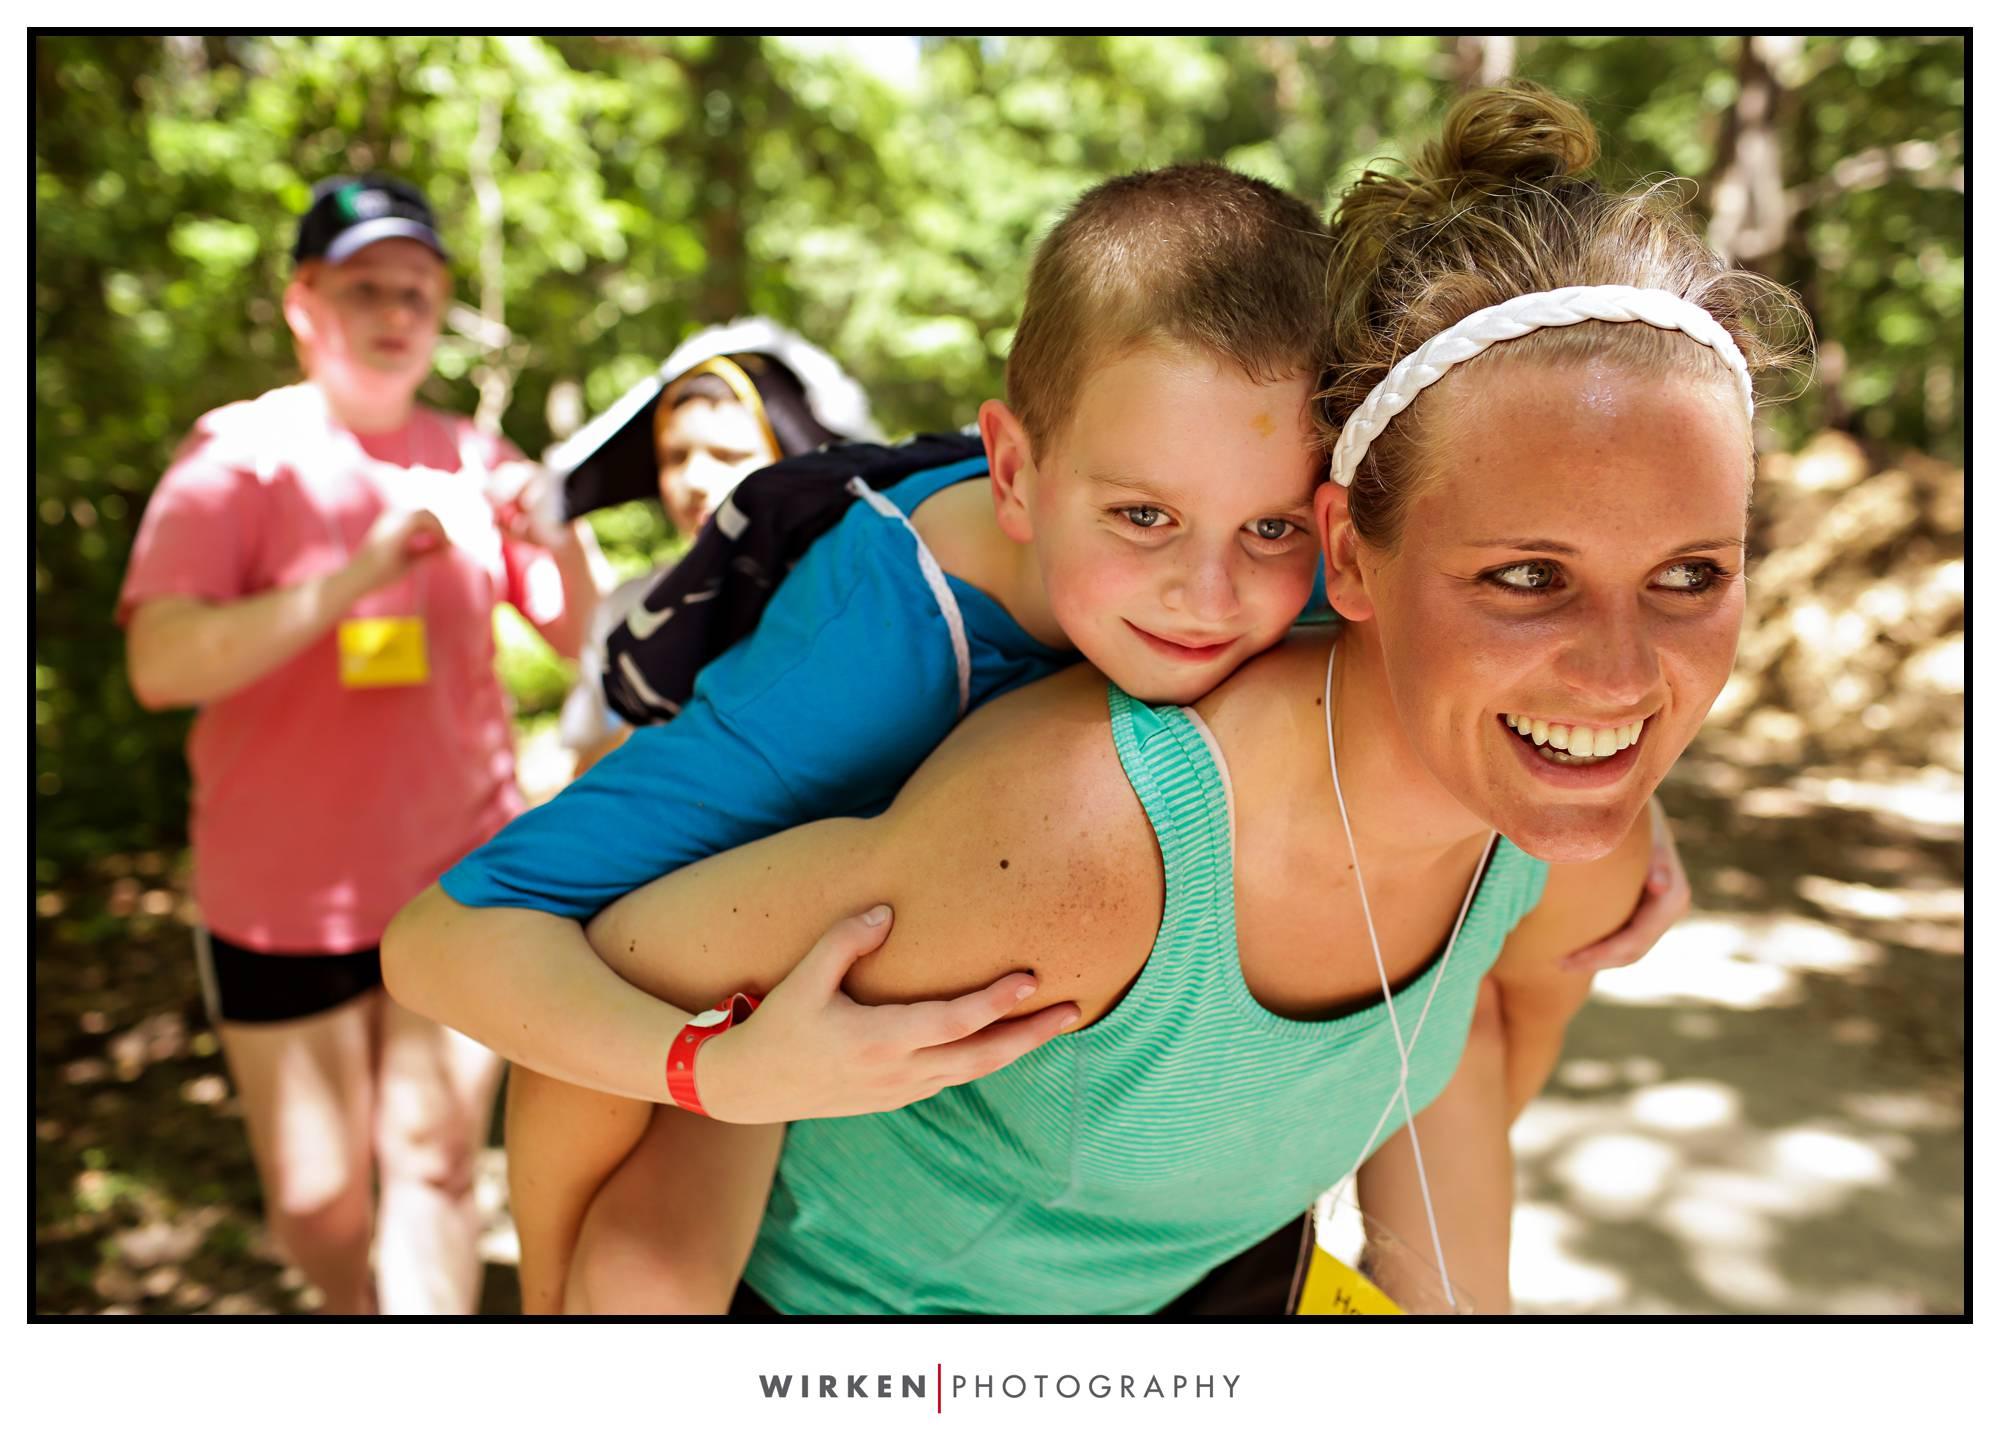 Camp Encourage in Kansas City